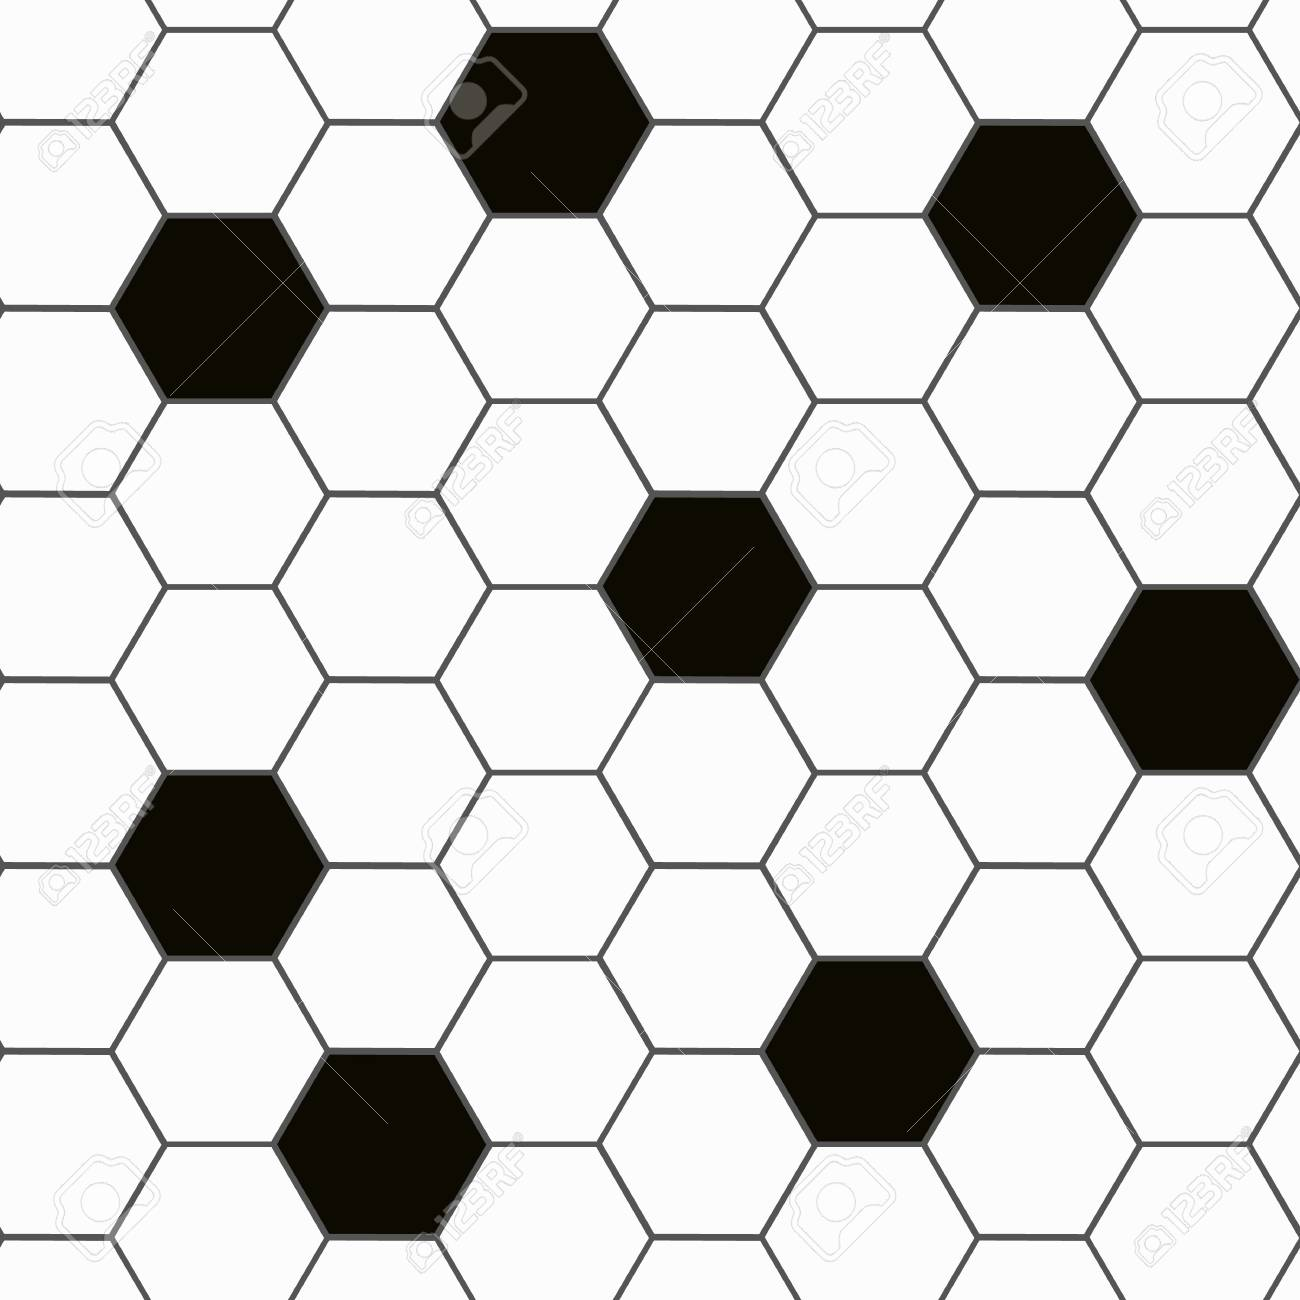 black and white hexagon tile seamless background pattern eps